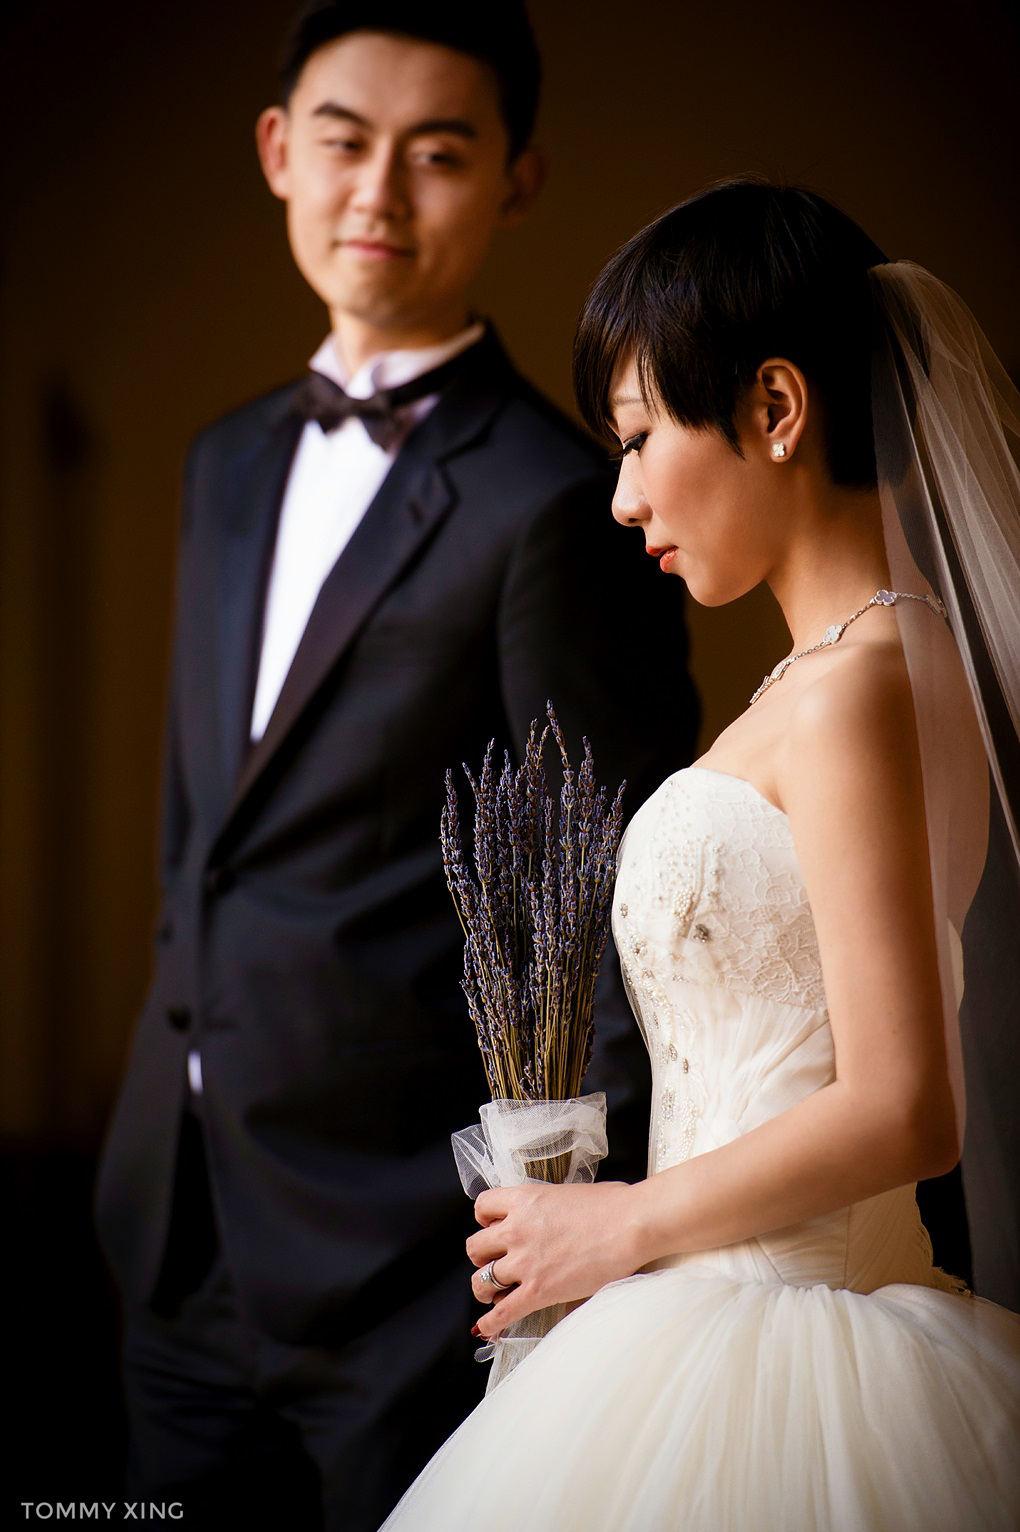 洛杉矶婚纱照 - Los Angeles Pre Wedding - Tommy Xing08.jpg